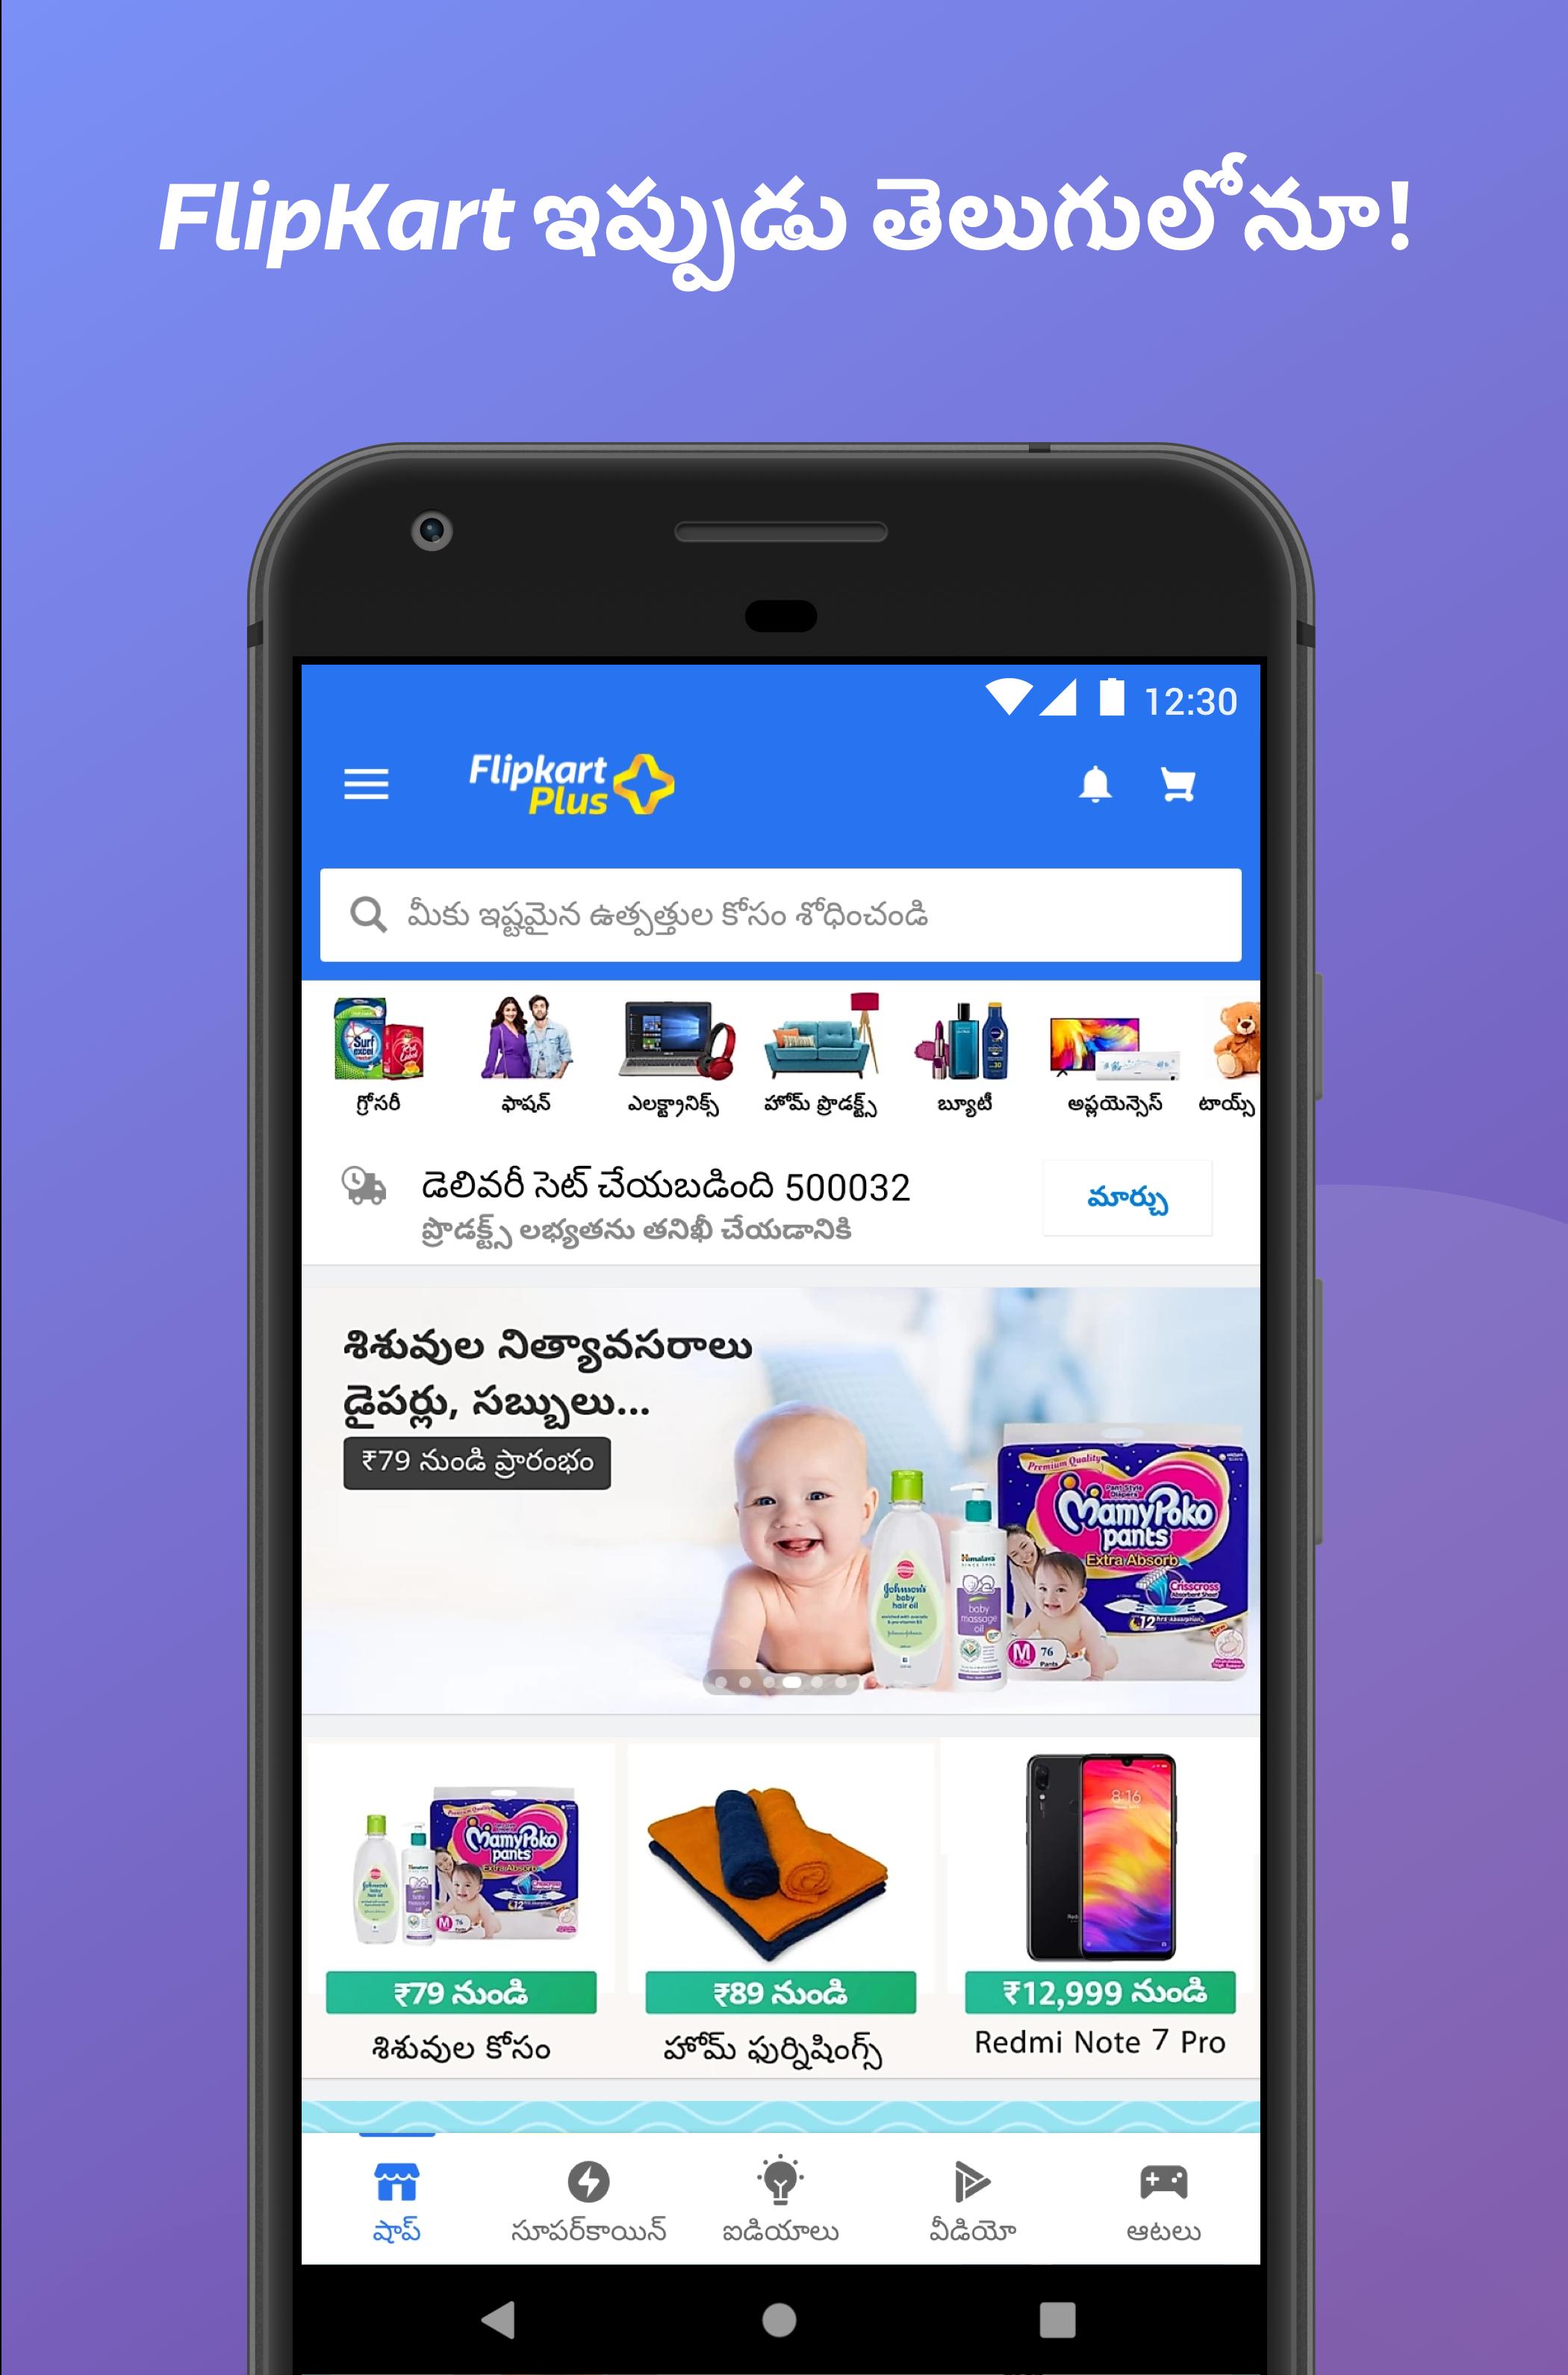 The new Telugu interface